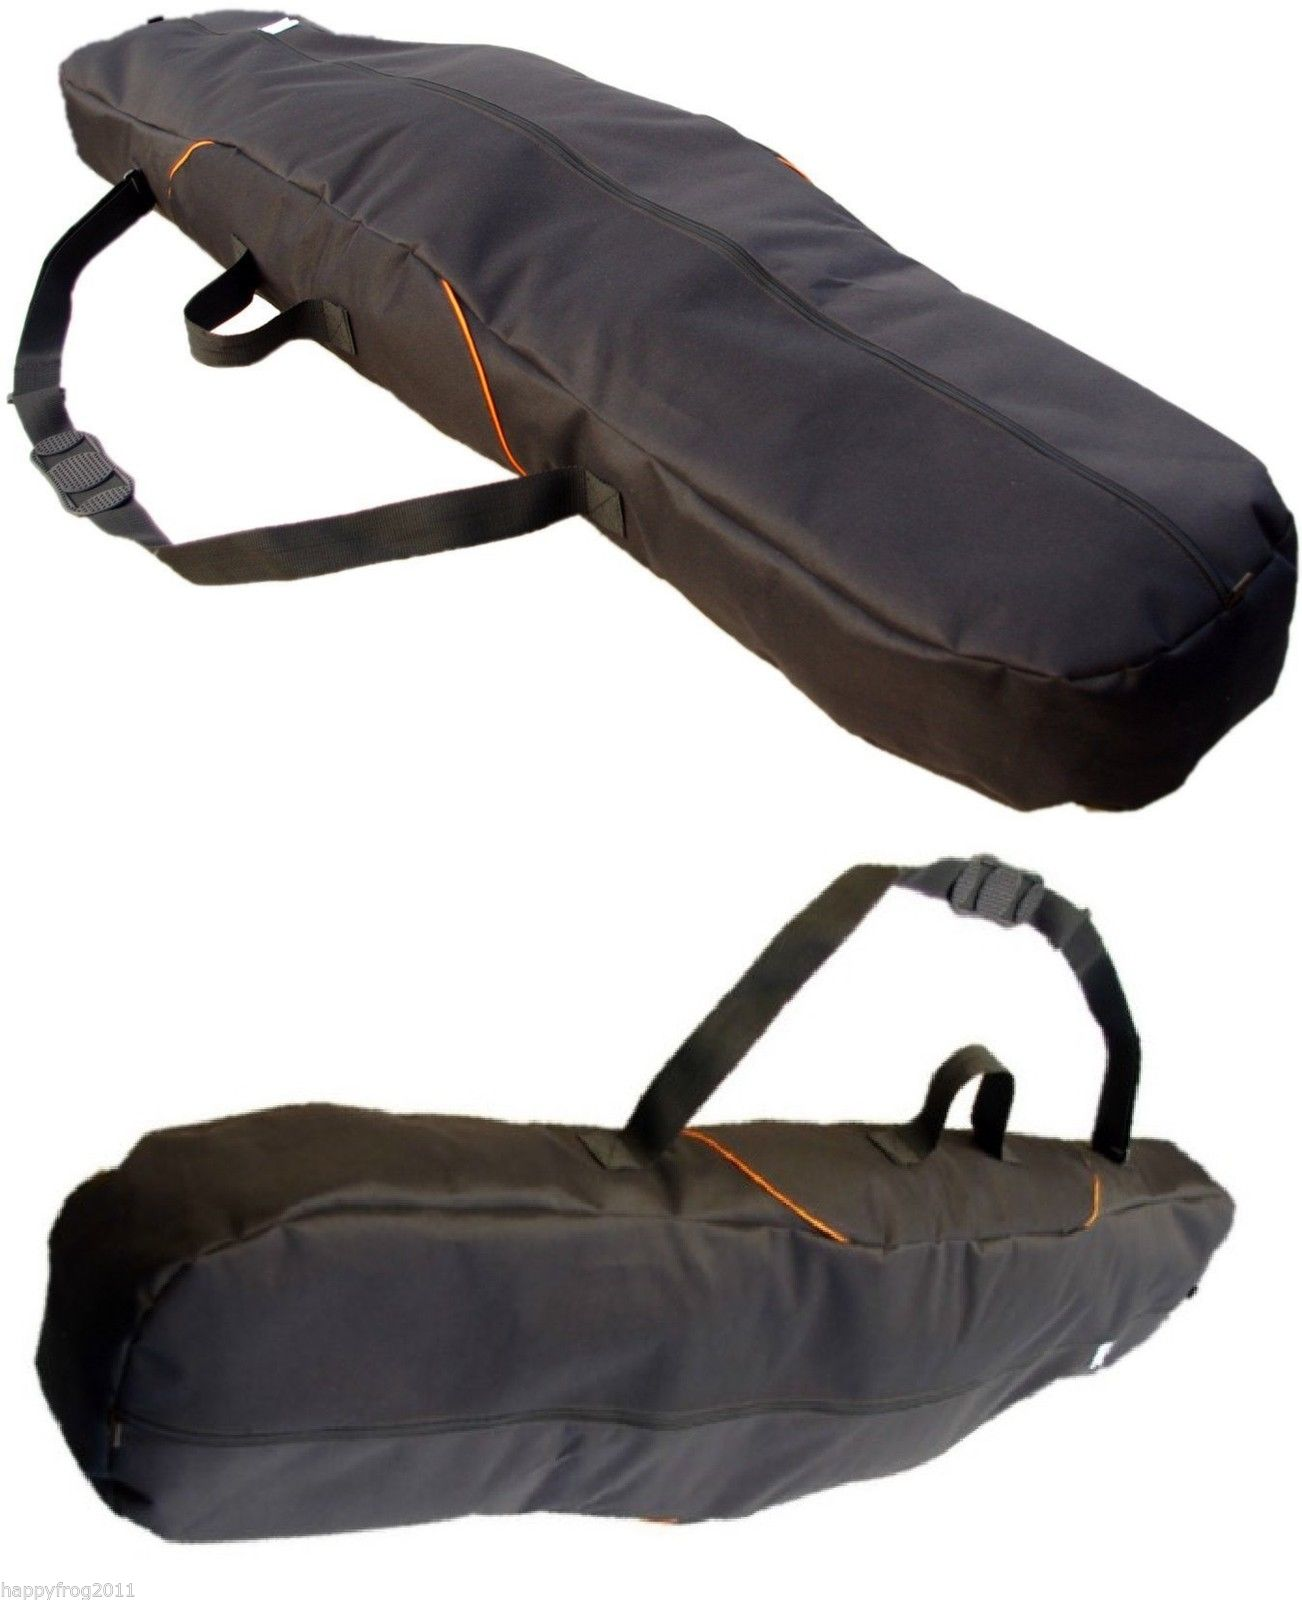 Waterproof SNOWBOARD BAG 155cm or 165cm   TRAVEL CASE   LUGGAGE ... d300d08585771